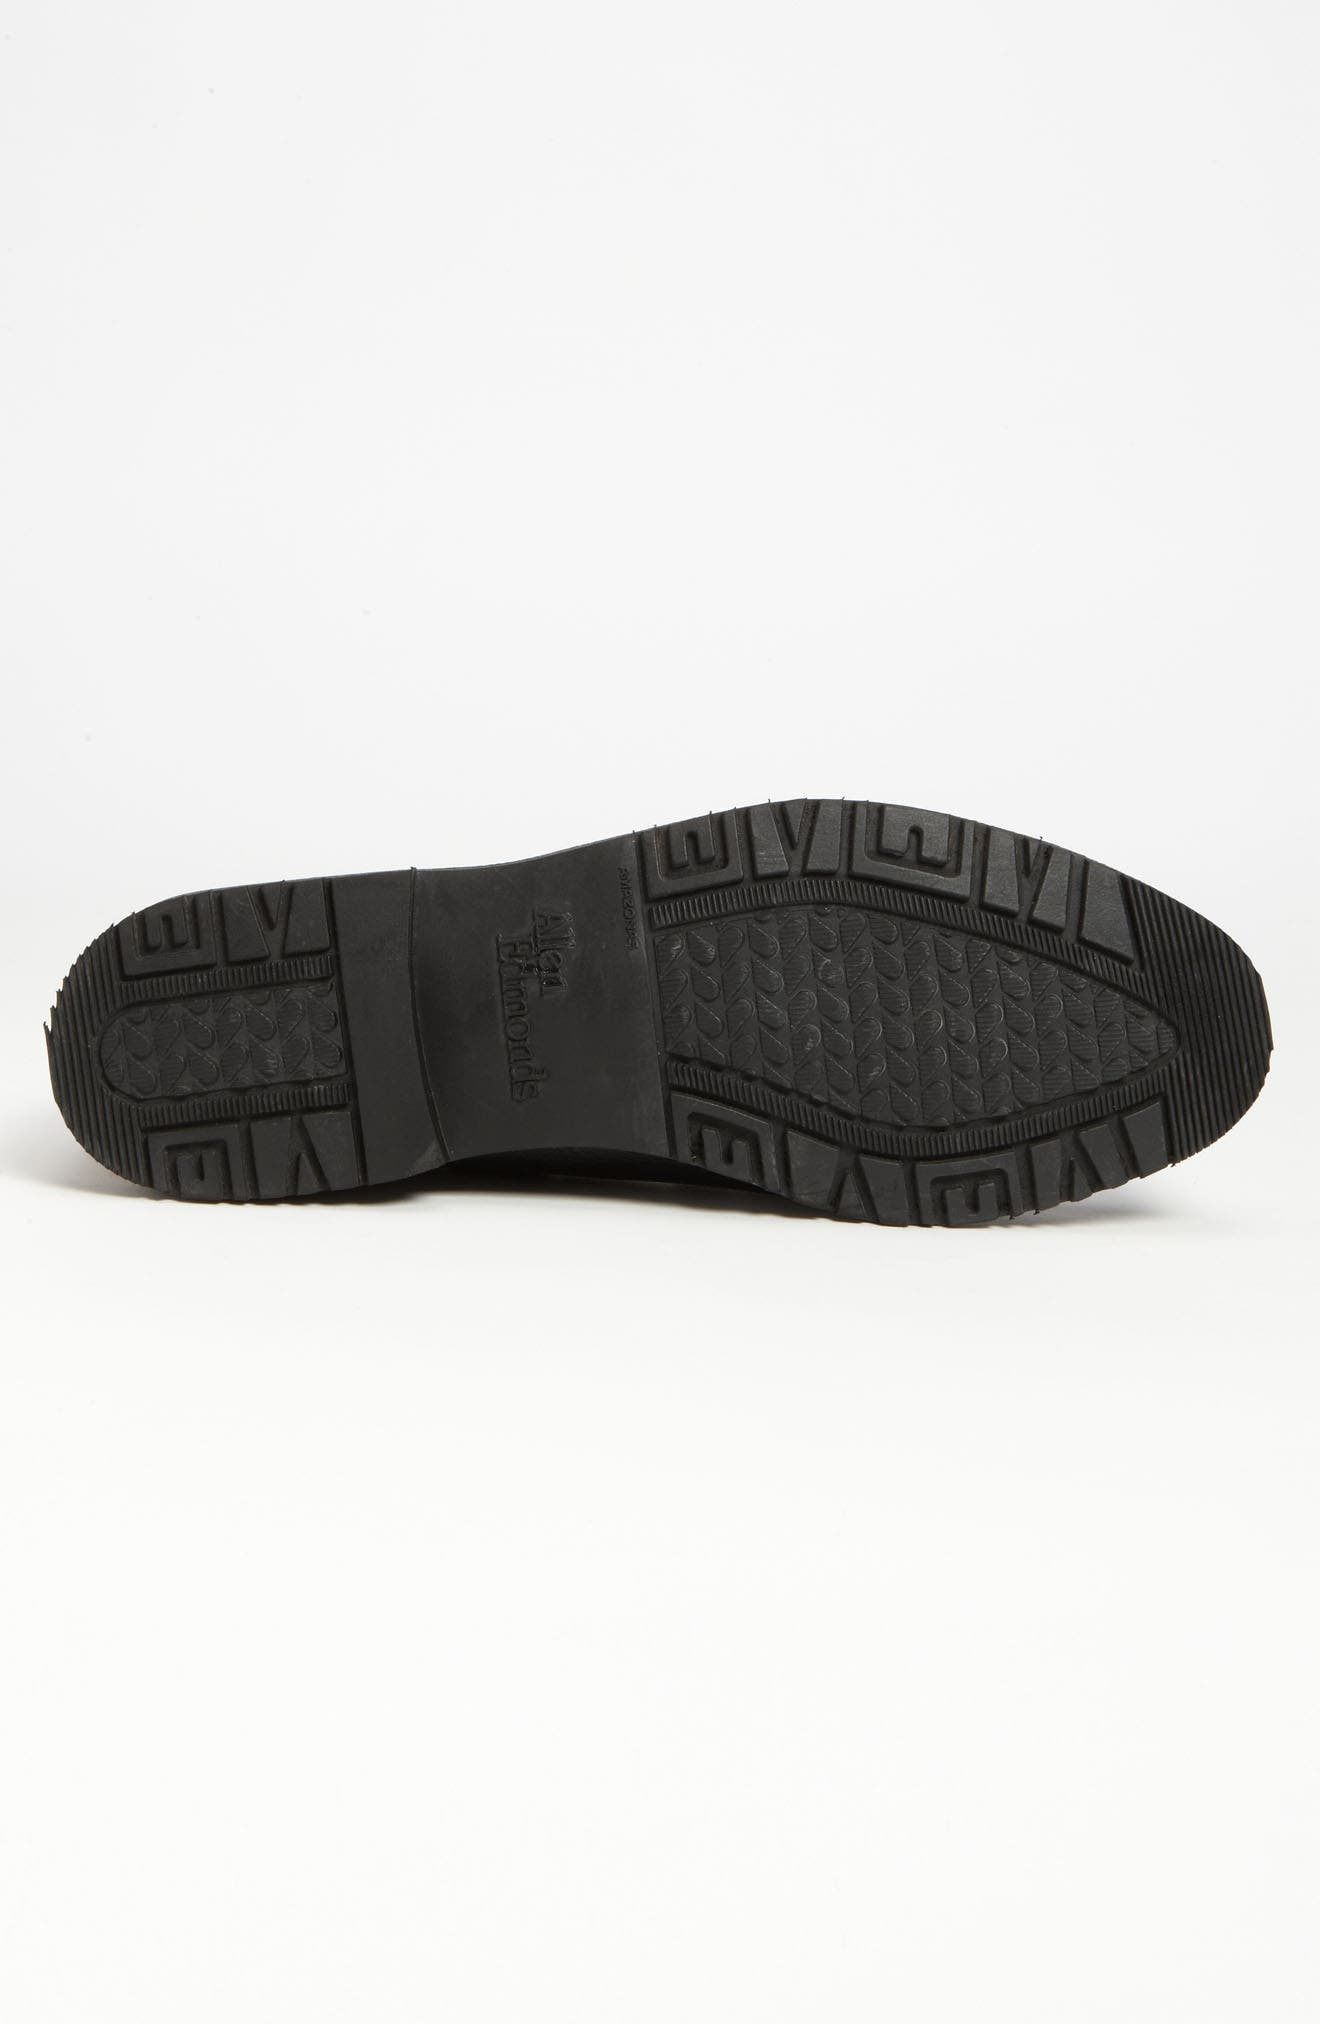 'Nashua' Tassel Loafer,                             Alternate thumbnail 5, color,                             BLACK/ BROWN